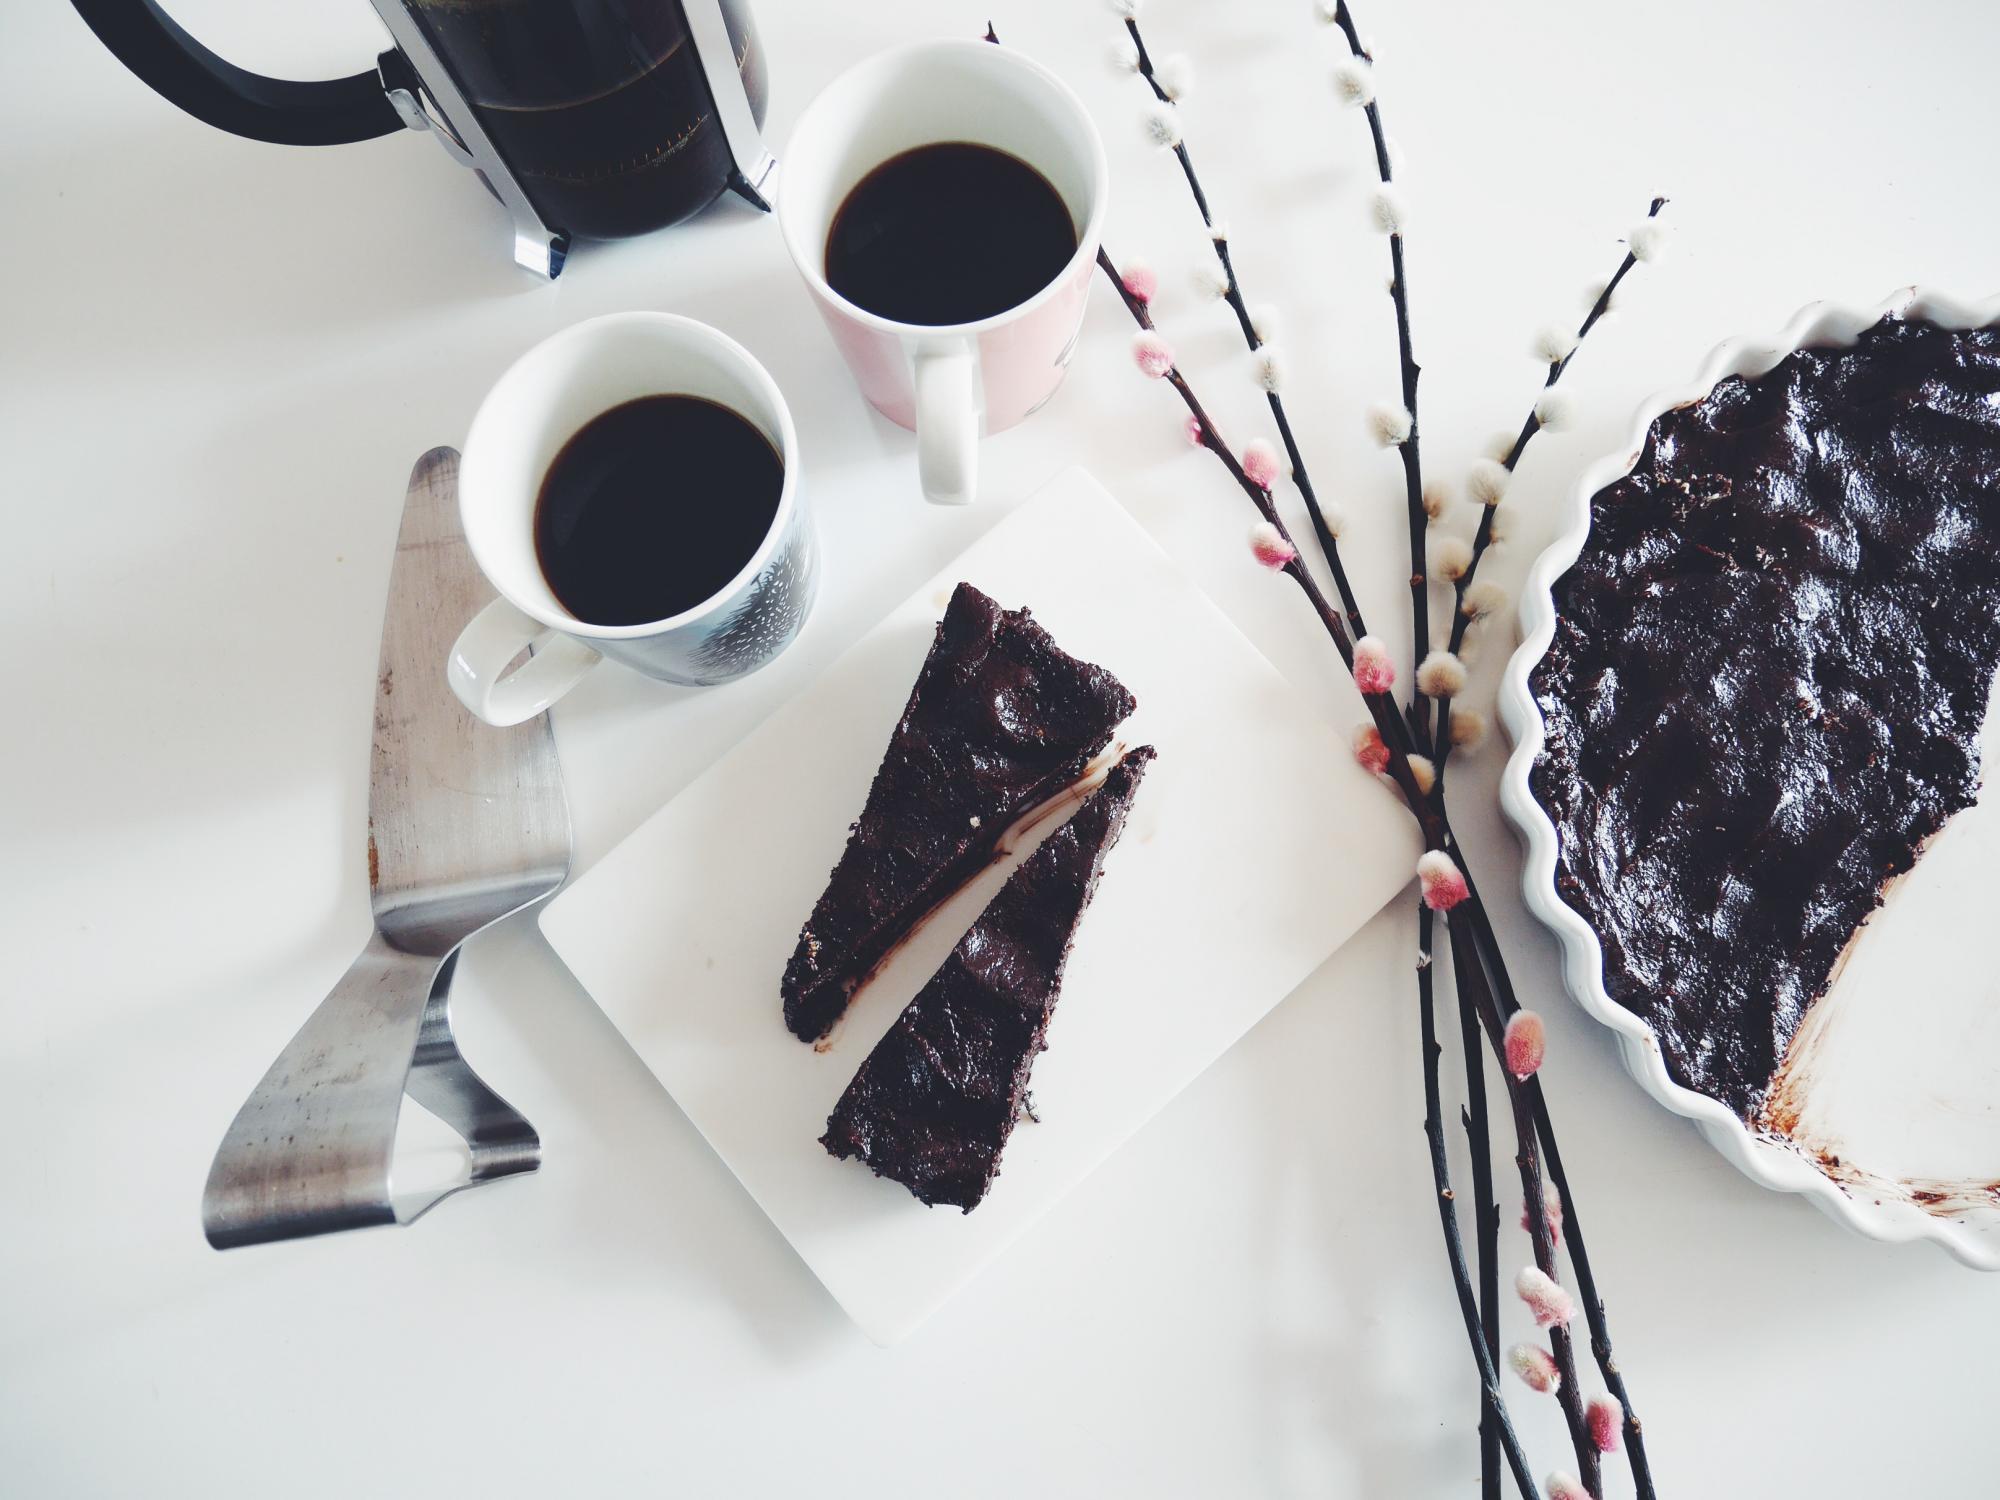 Världens godaste chokladkaka